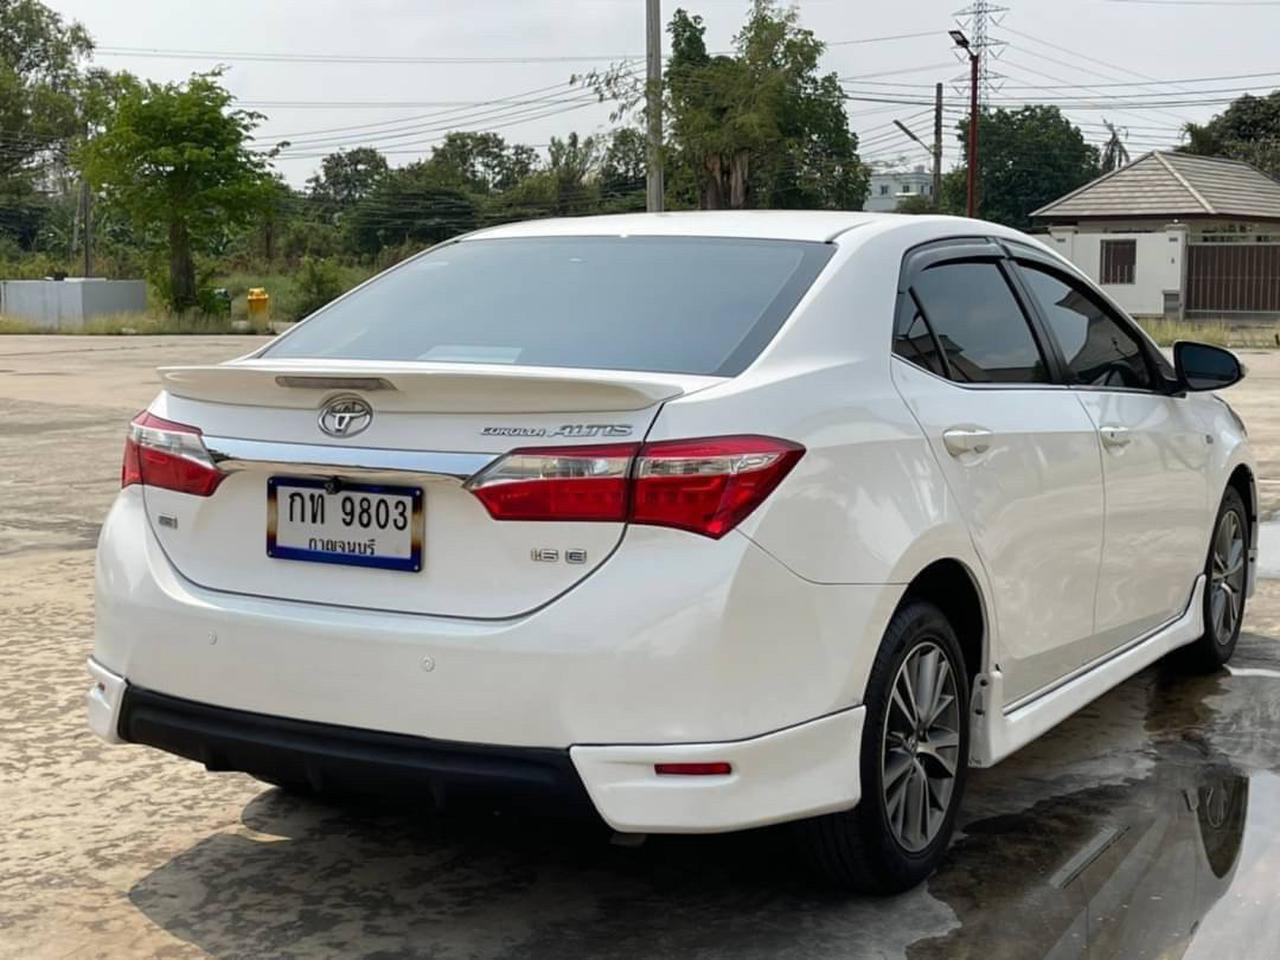 62 Toyota Altis 1.6 E (CNG) ปี 2014 สีขาว เกียร์ออโต้ รูปที่ 1